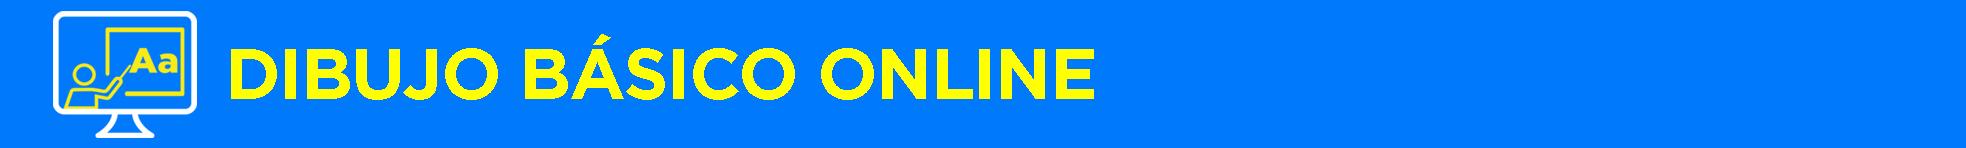 Banner dibujo básico general Santa Gráfic online